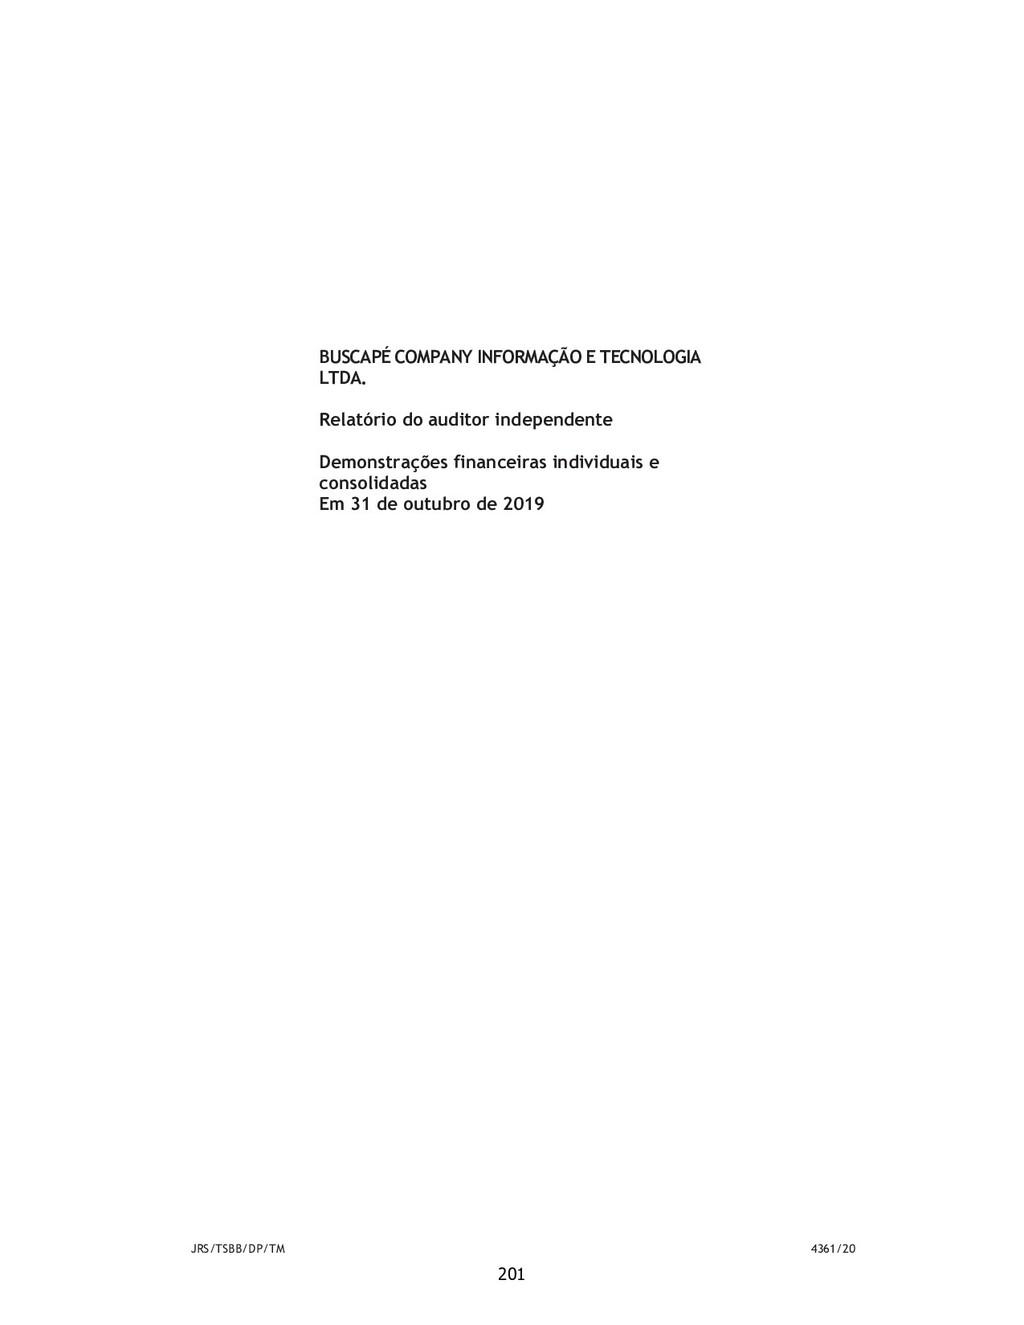 JRS/TSBB/DP/TM 4361/20 BUSCAPÉ COMPANY INFORMAÇ...